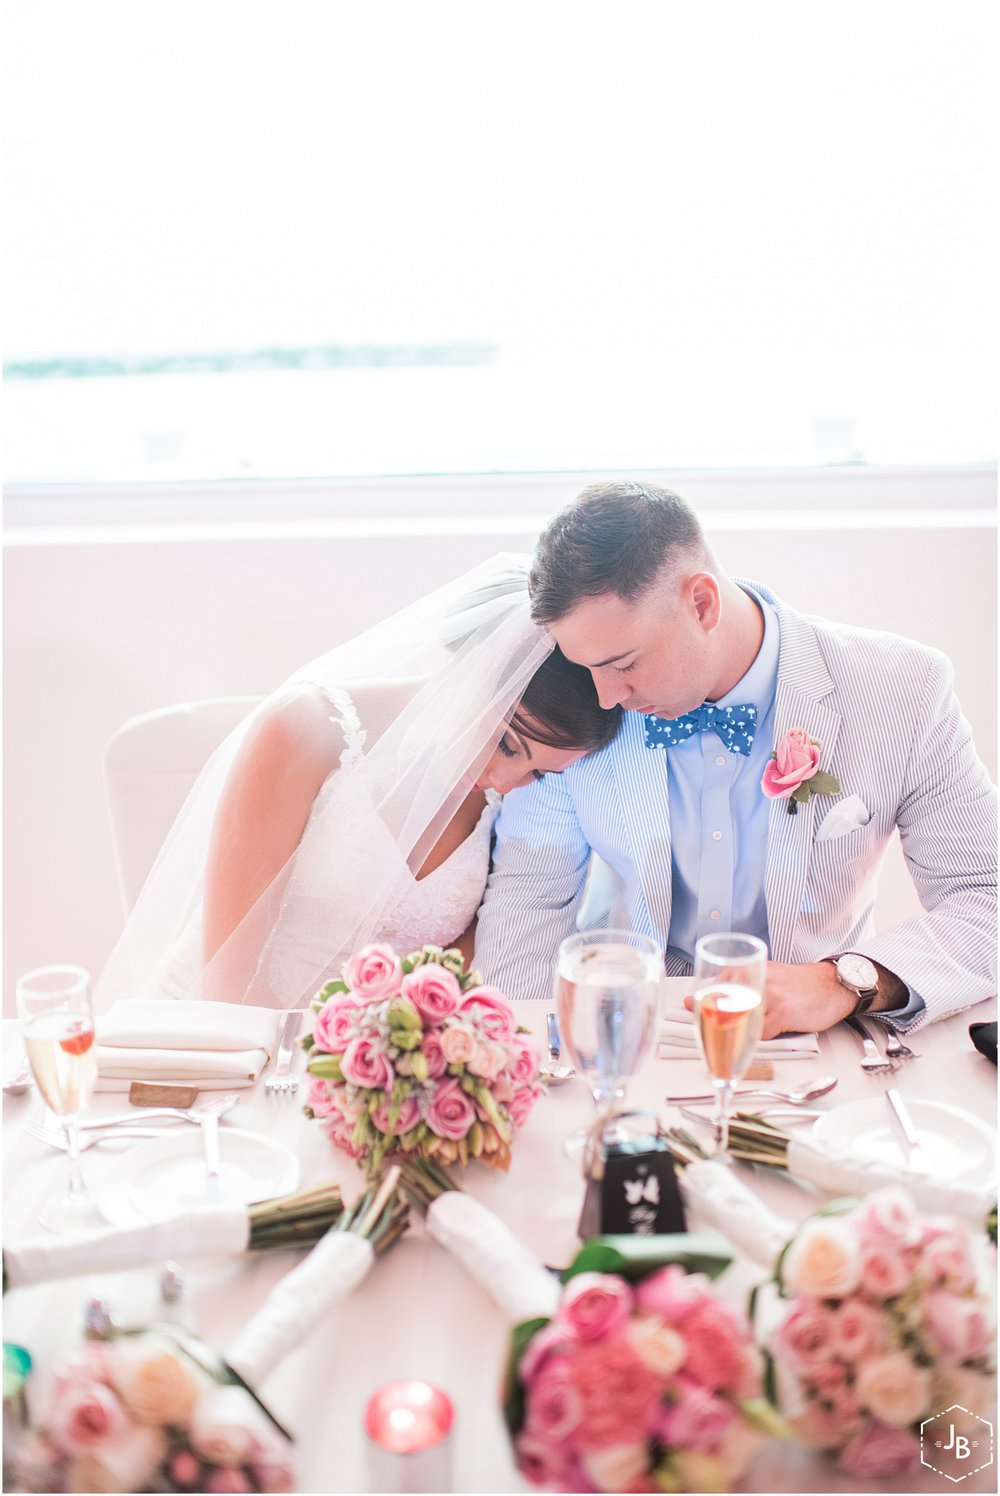 WeddingPhotographerSouthFlorida_0072.jpg